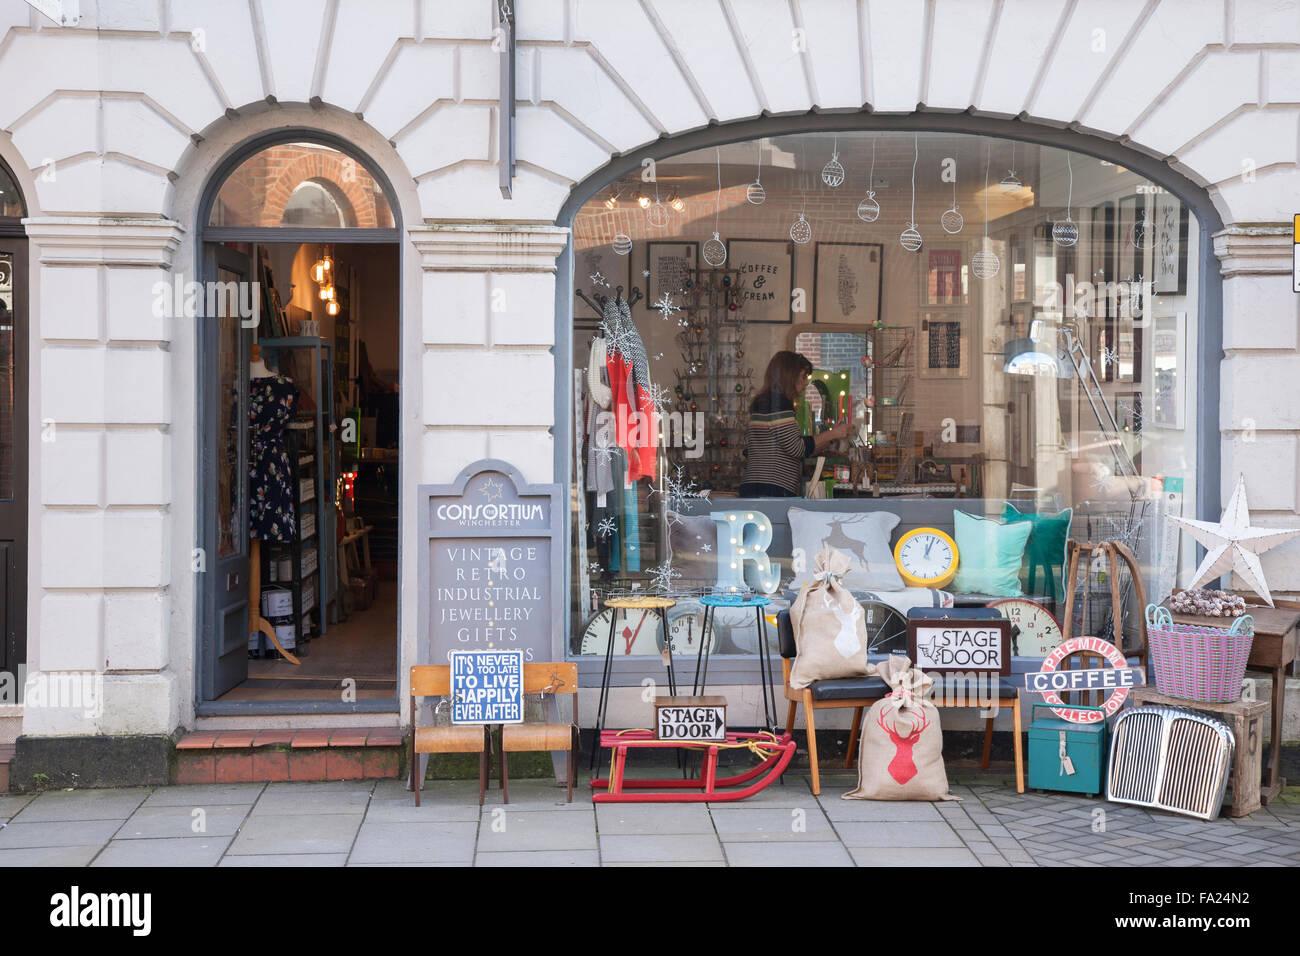 Consortium Shop, Winchester, England - Stock Image